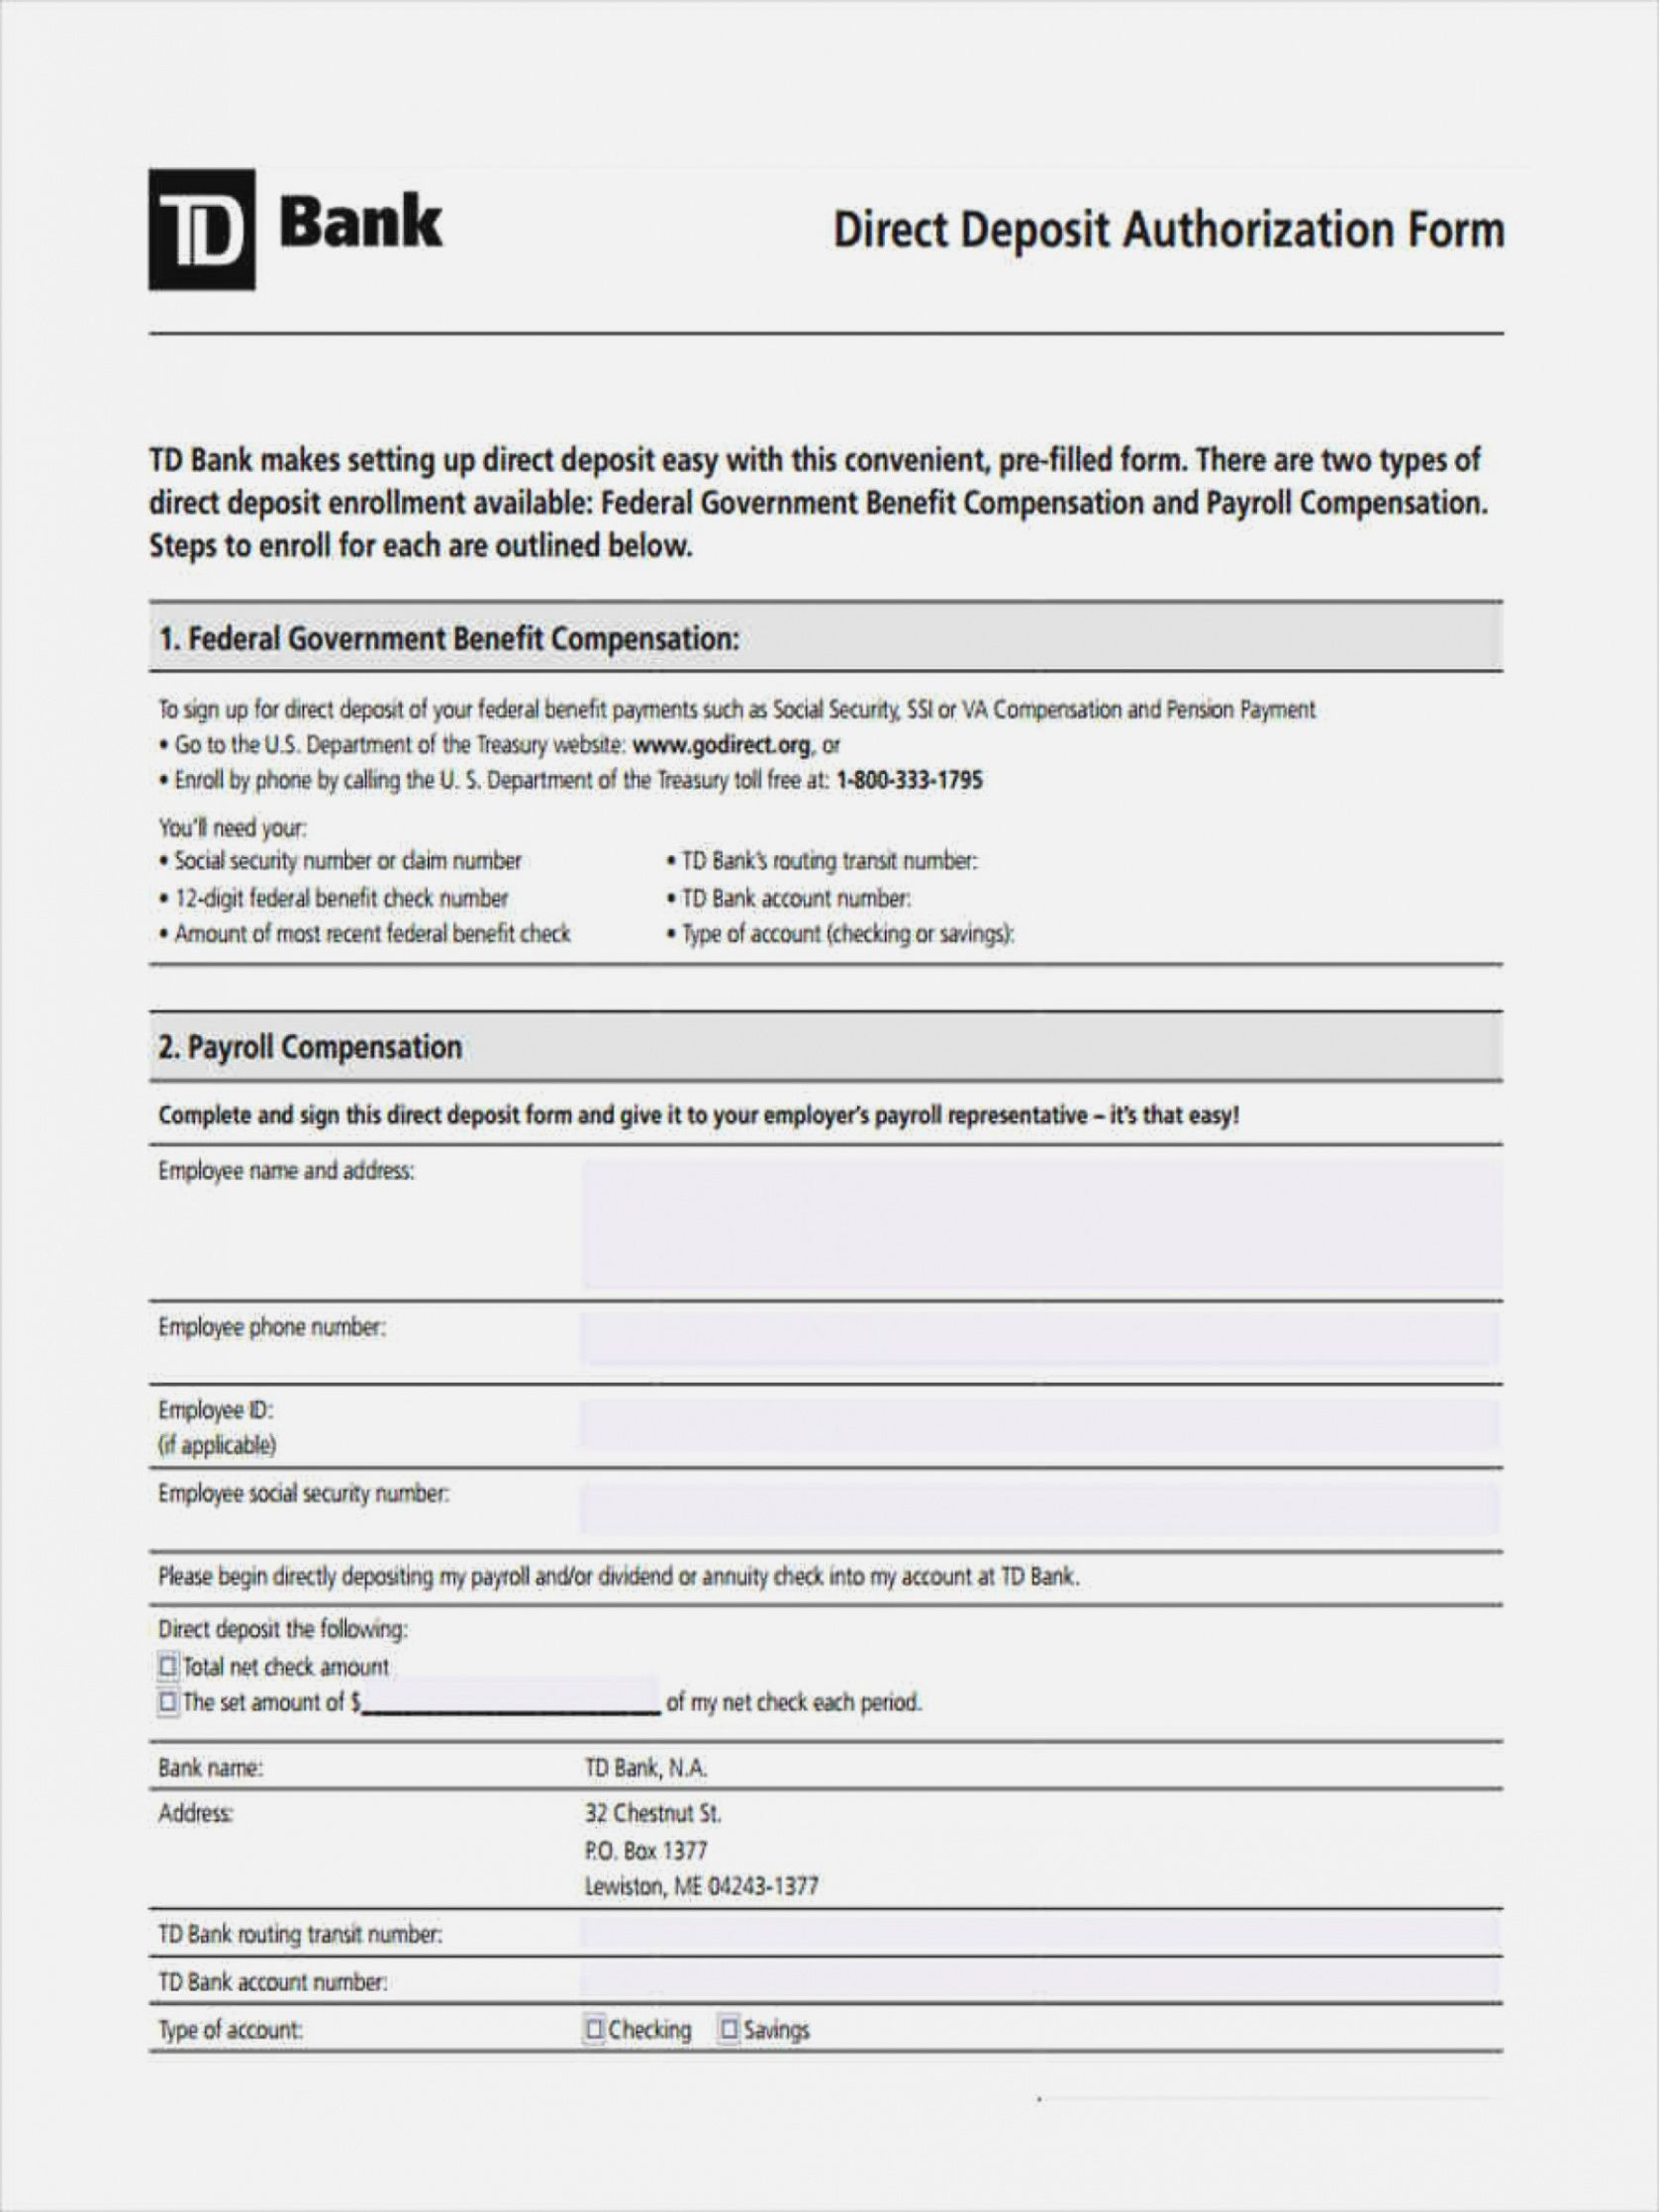 sample ✓ blank direct deposit authorization form sample 2383 federal government direct deposit form example